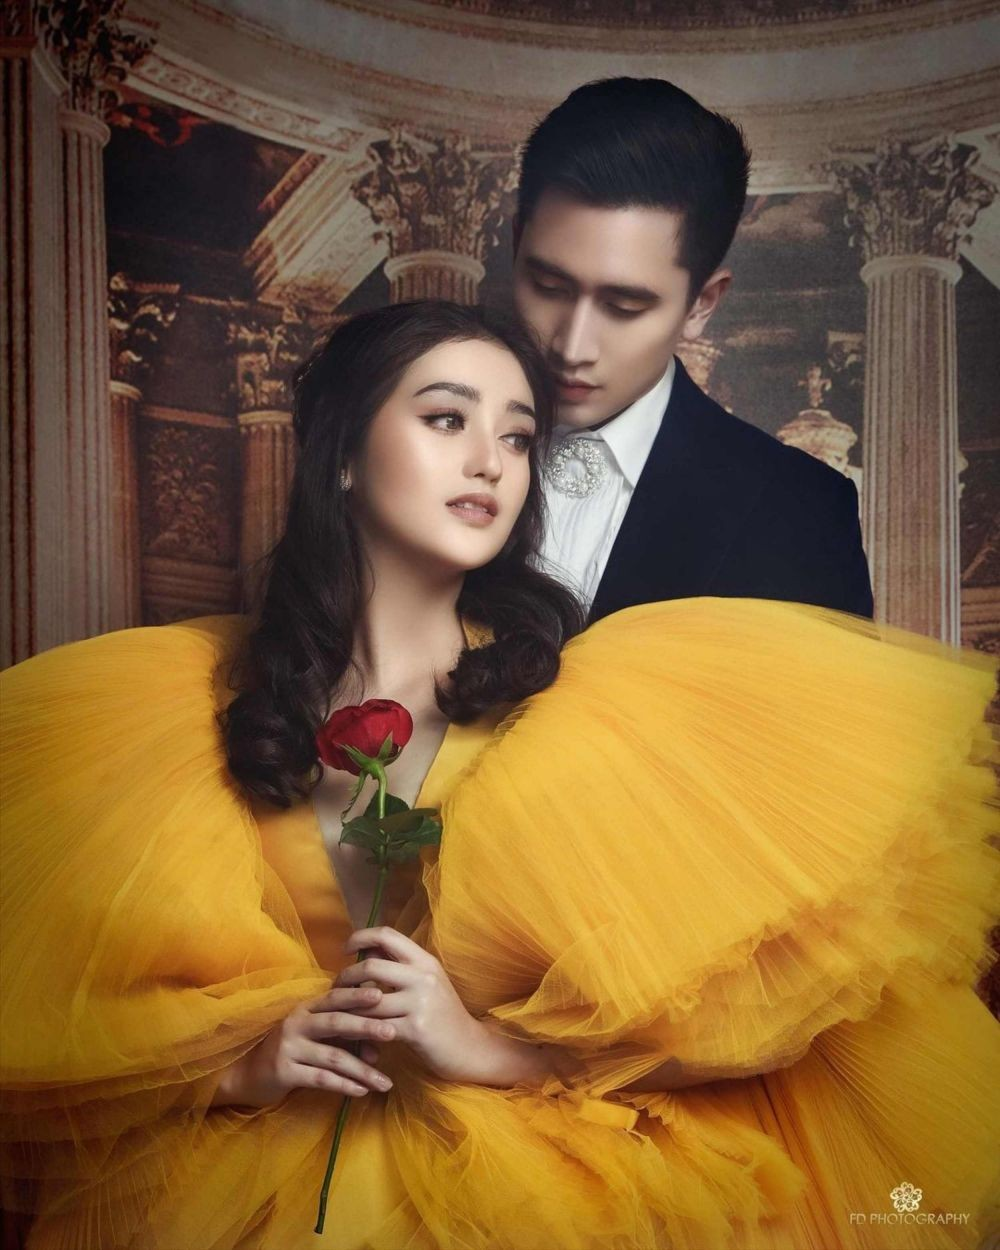 Gaya Pasangan Sinetron saat Pemotretan, Mesra Layaknya Pre-Wedding!